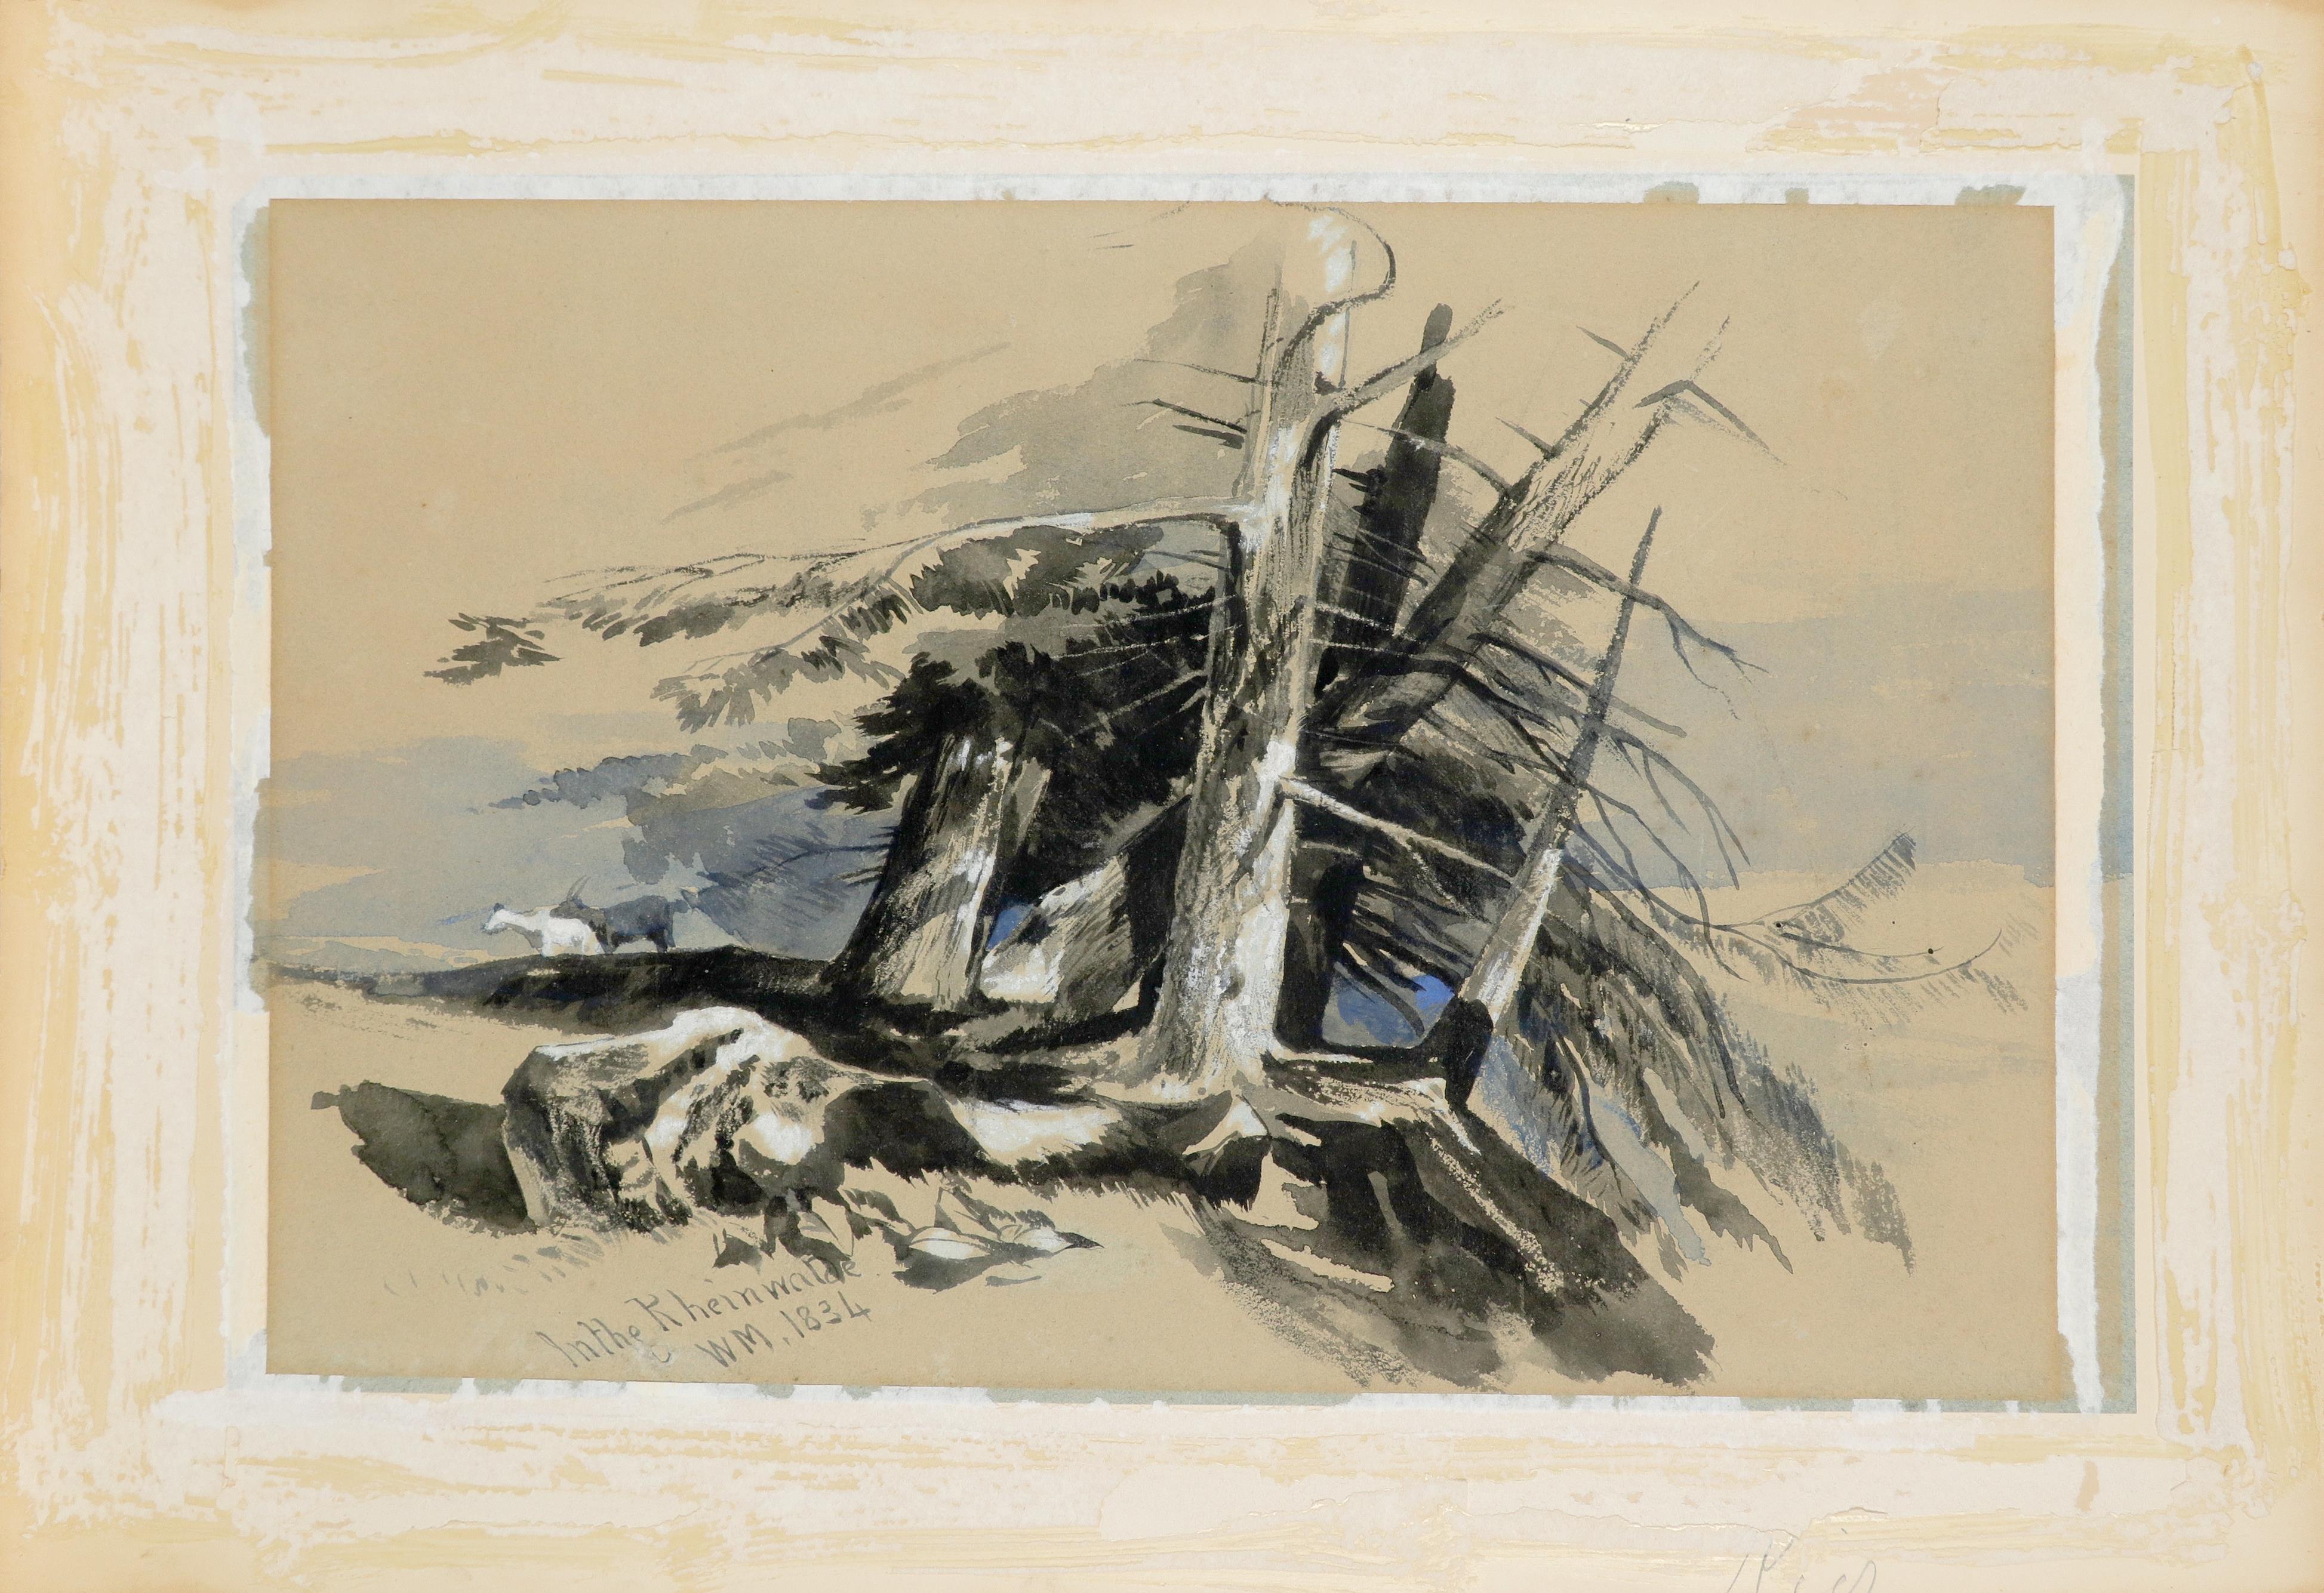 William James Müller (1812-1845) In the Rheinwalde Signed, inscribed and dated In the Rheinwalde / - Image 2 of 3